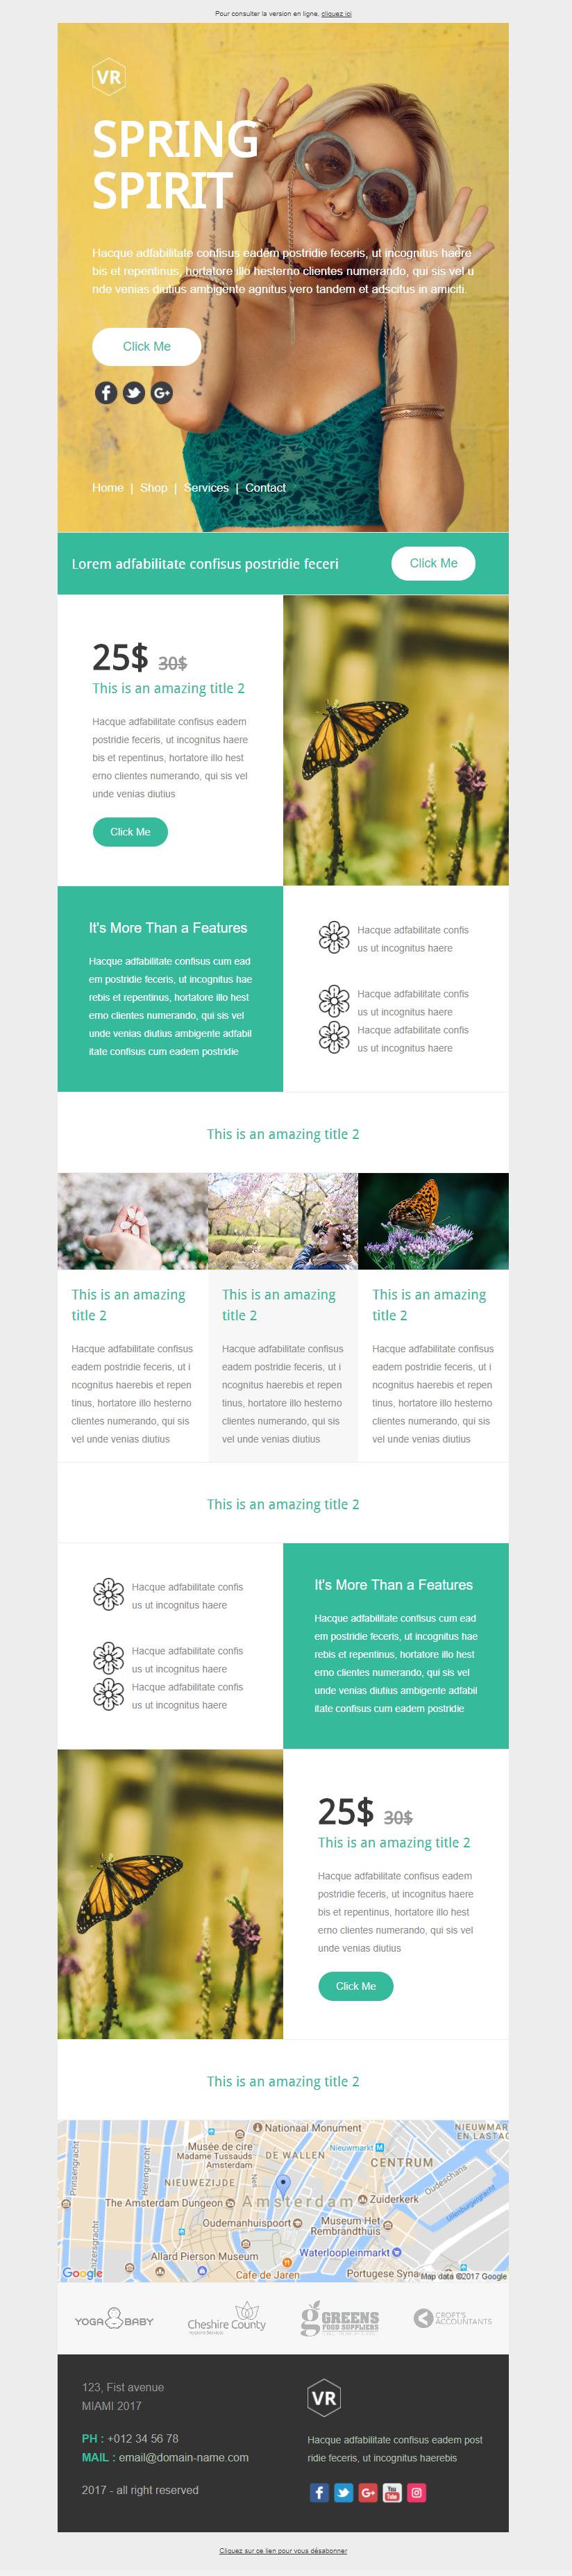 Exemple newsletter VR Spring